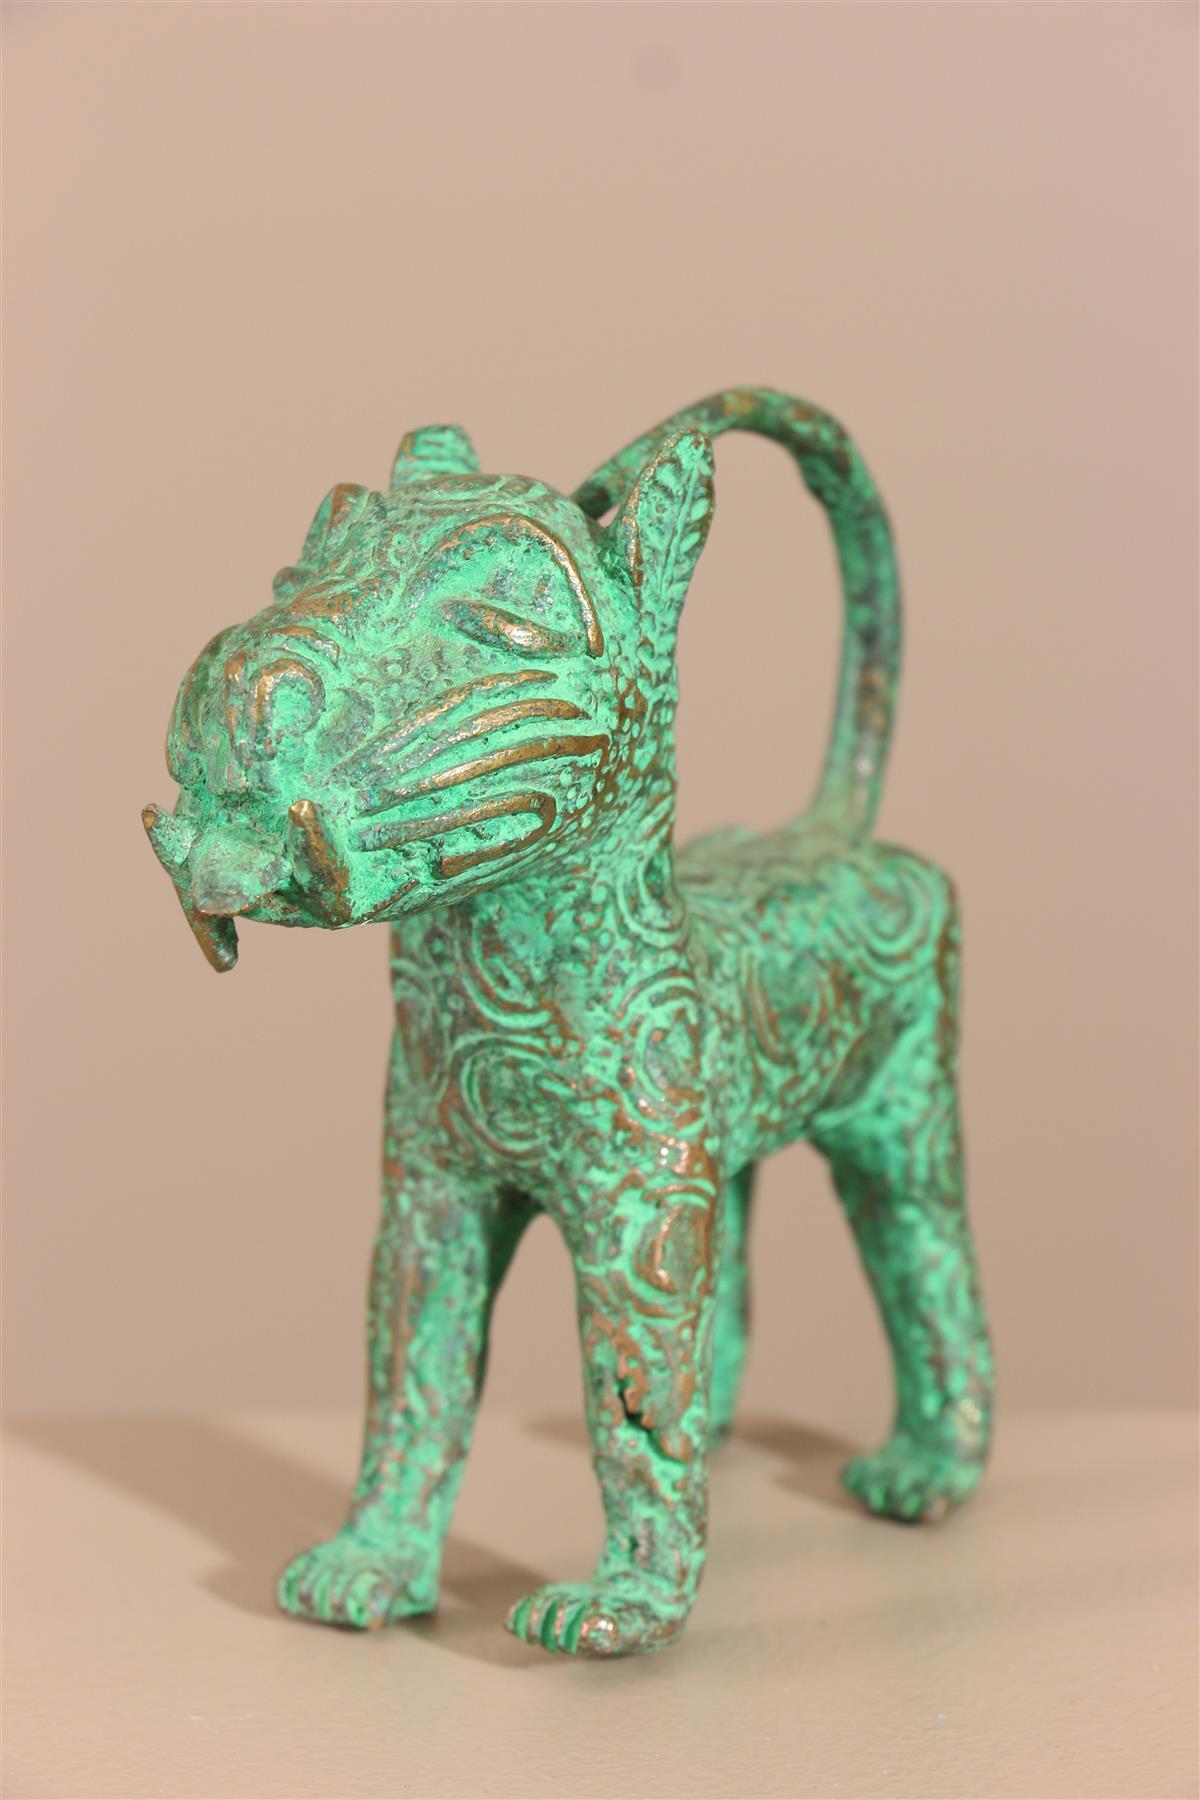 Bronze Bénin - Déco africaine - Art africain traditionnel